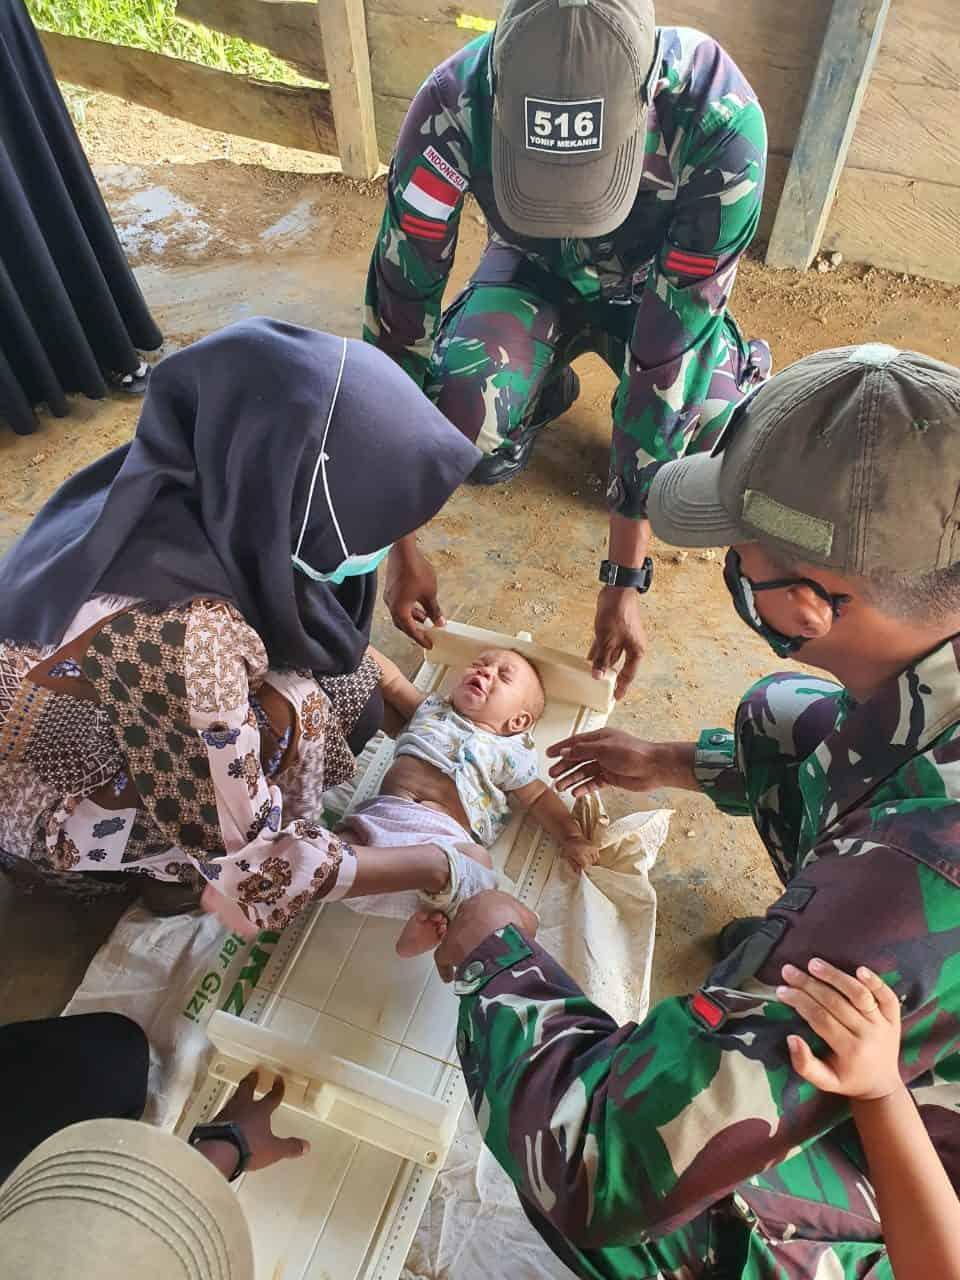 Satgas Pamtas RI-PNG Yonif Mekanis 516/CY Bersama Puskesmas Gelar Pelayanan Kesehatan